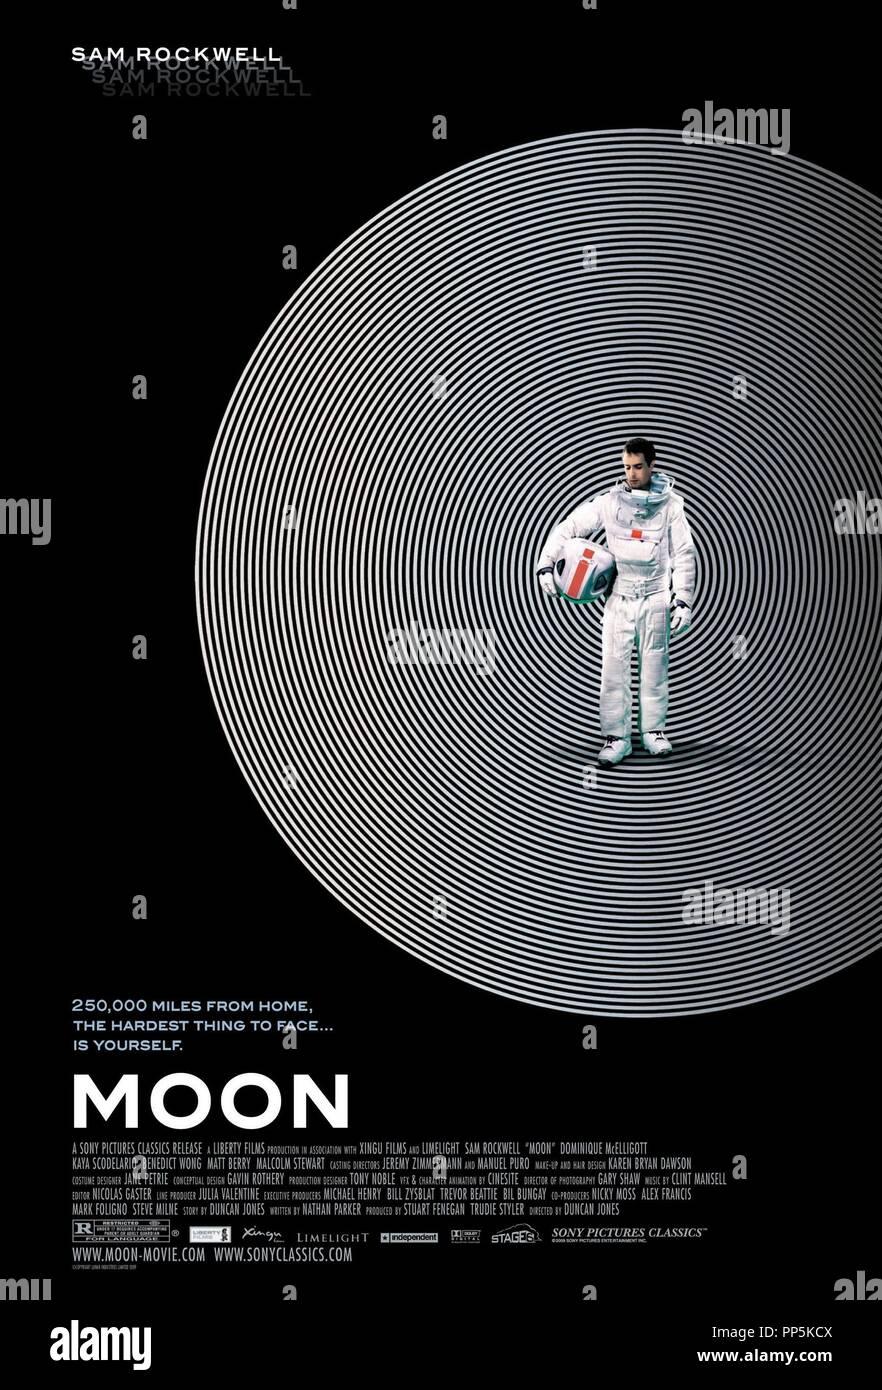 Original film title: MOON. English title: MOON. Year: 2009. Director: DUNCAN JONES. Credit: XINGU FILMS / Album - Stock Image